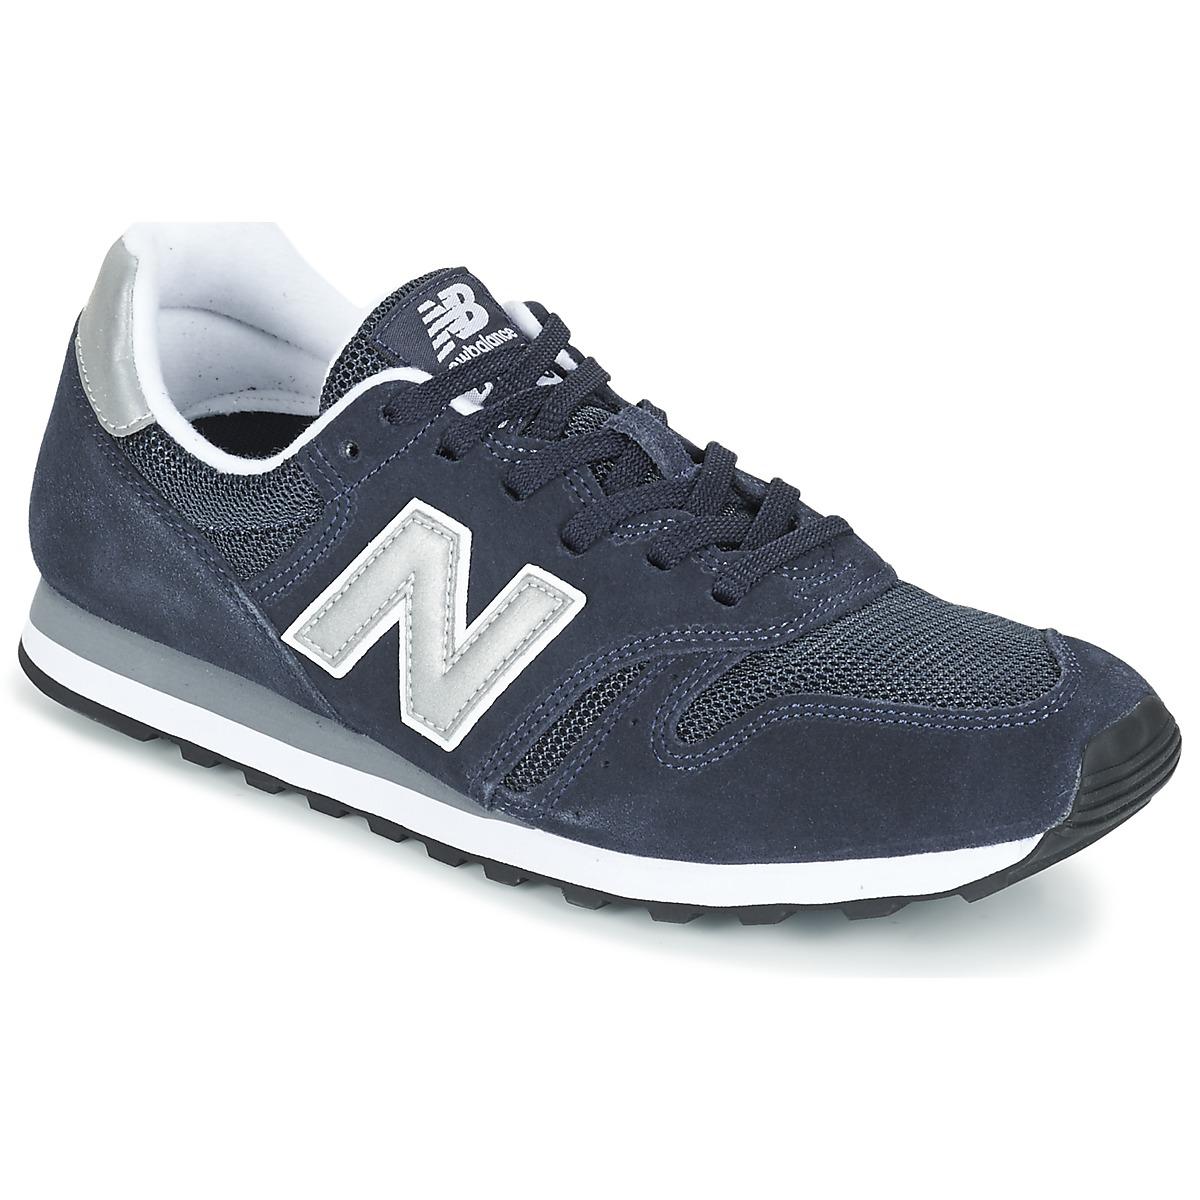 New Balance ML373 Marine - Kostenloser Versand bei Spartoode ! - Schuhe Sneaker Low  67,99 €